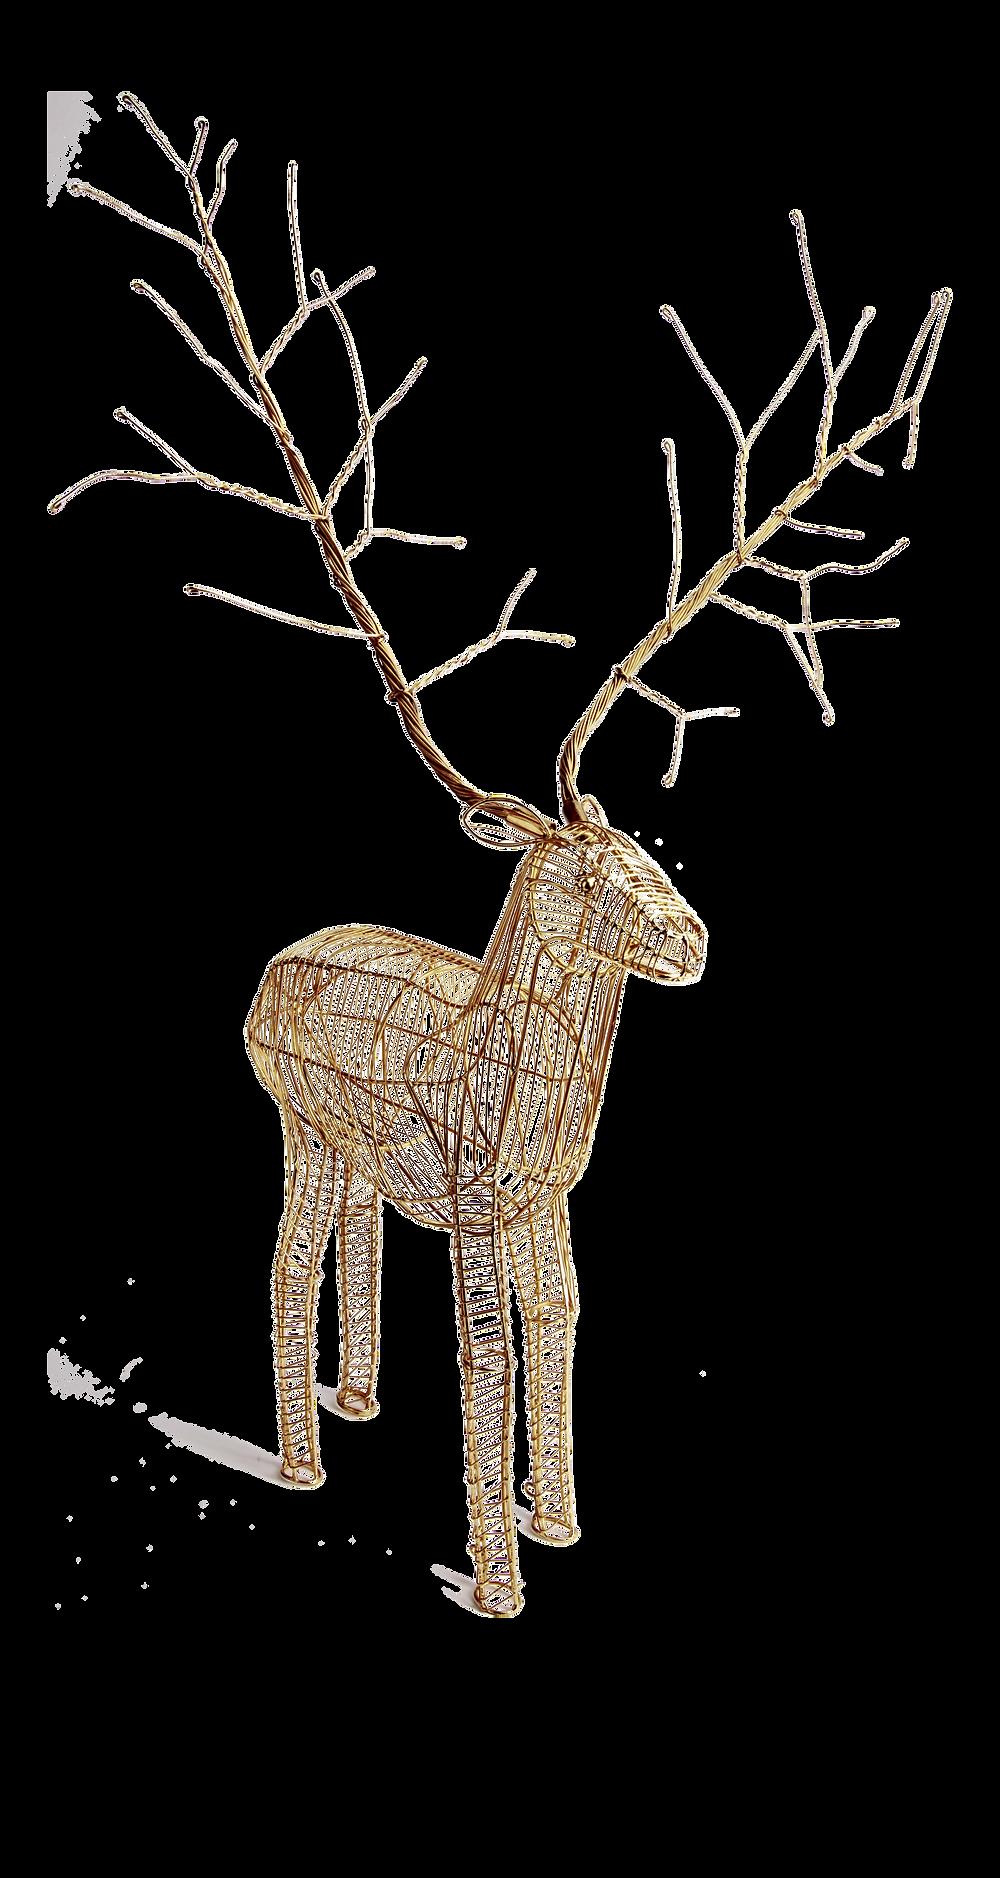 decoration-de-noel-renne-dore-1_250386